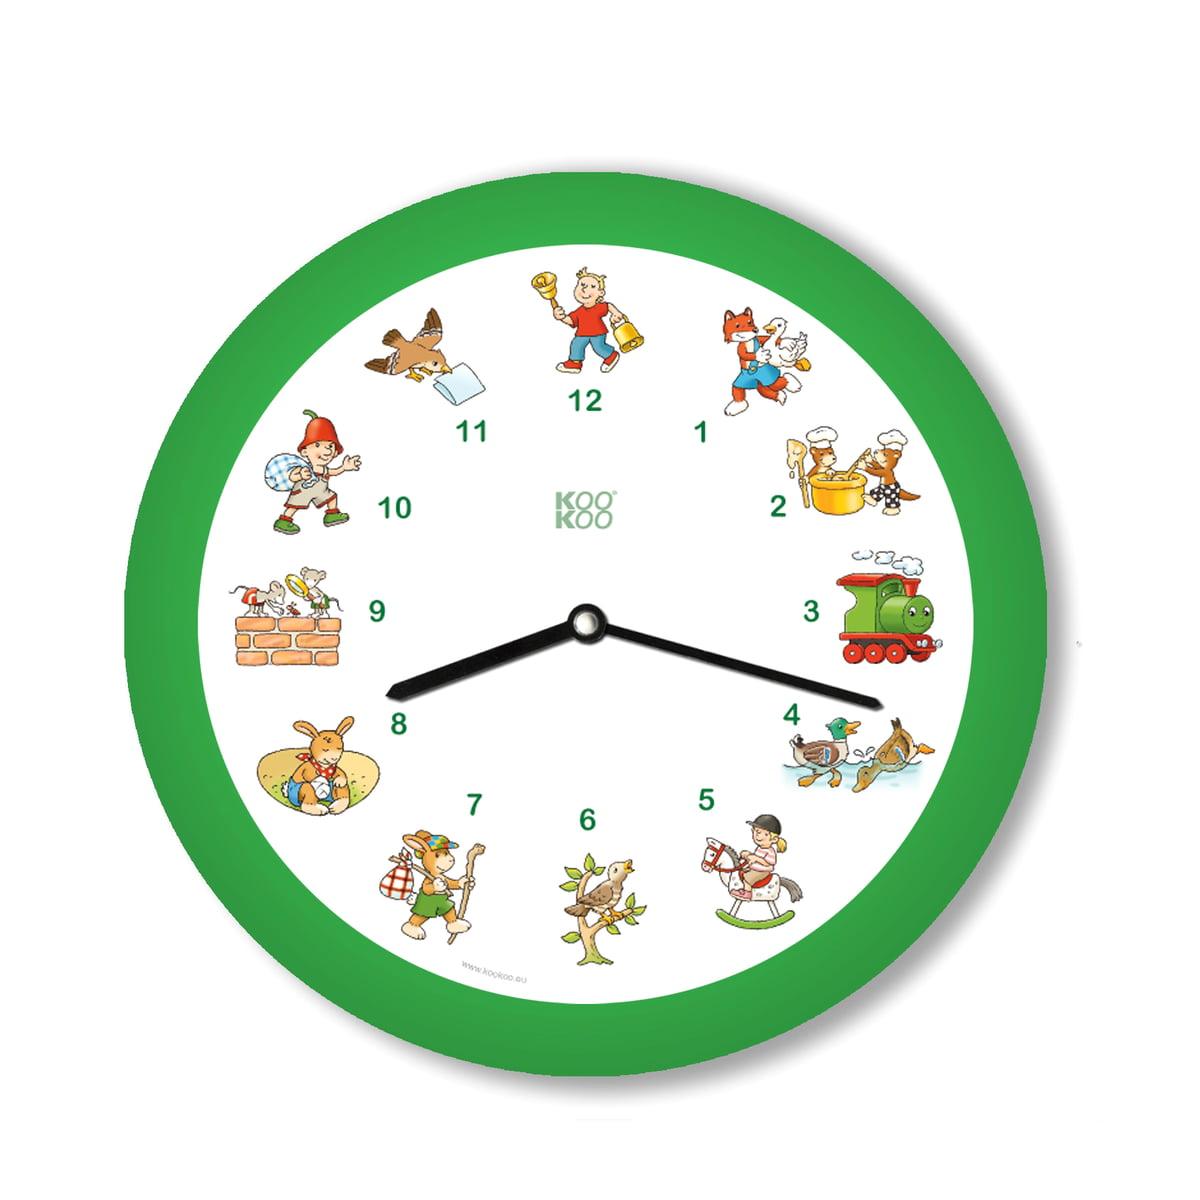 KooKoo - Kinderlieder Wanduhr, grün | Dekoration > Uhren > Wanduhren | Grün | Kunststoff -  holz -  aluminium | KooKoo